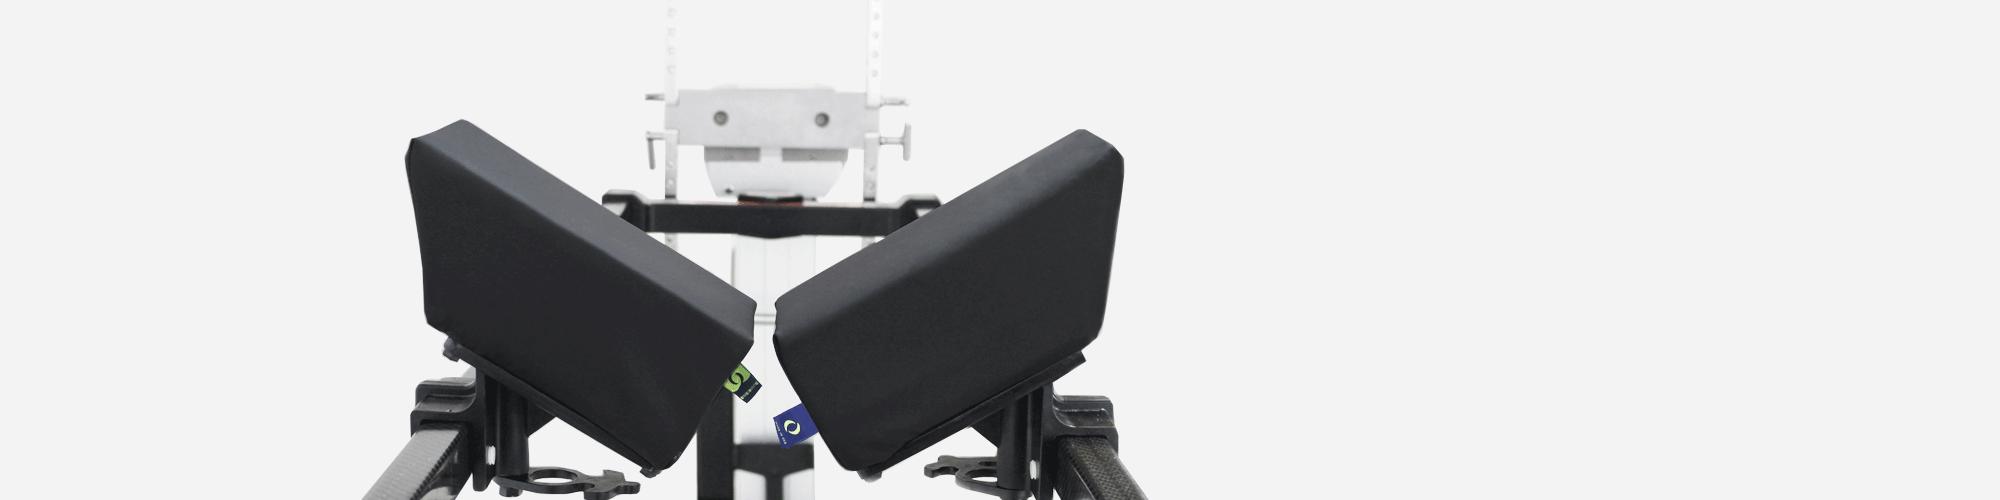 osi-table-pads1.png